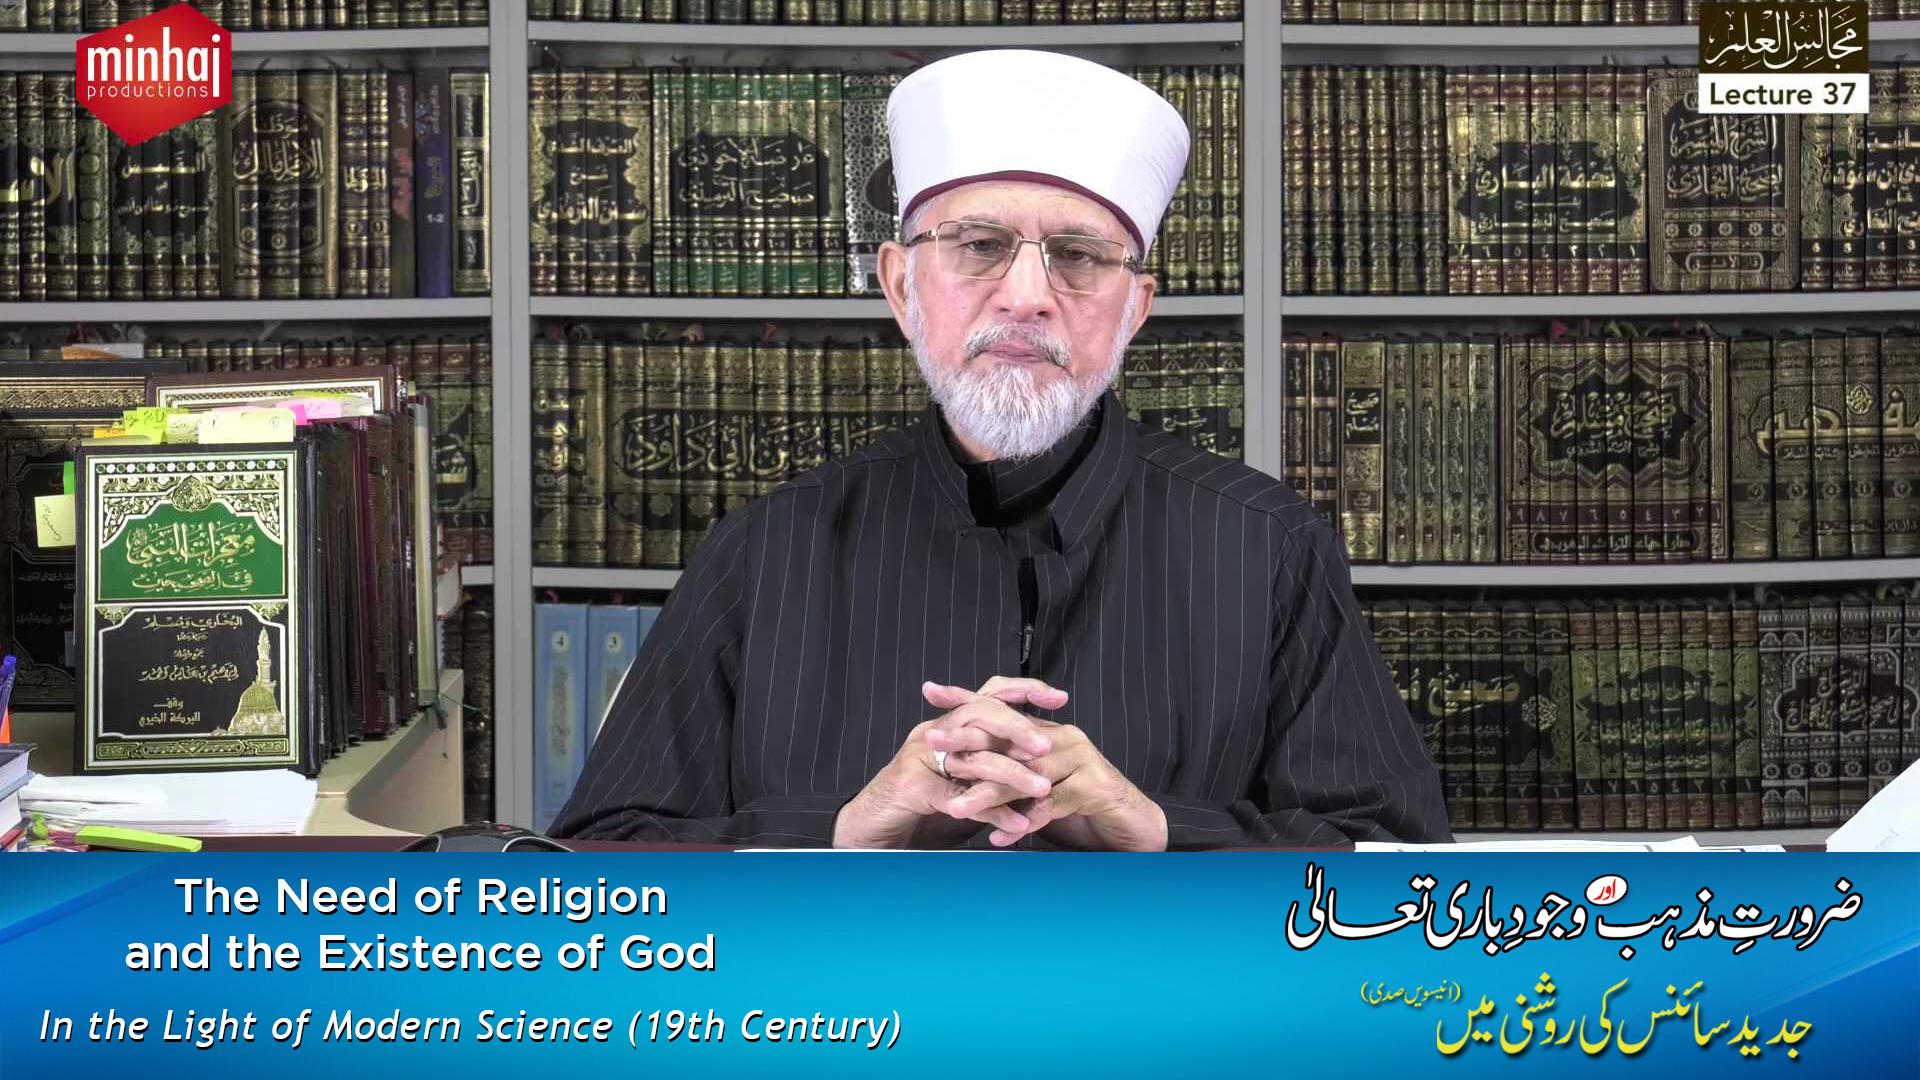 Majalis-ul-ilm (Lecture 37) - by Shaykh-ul-Islam Dr Muhammad Tahir-ul-Qadri